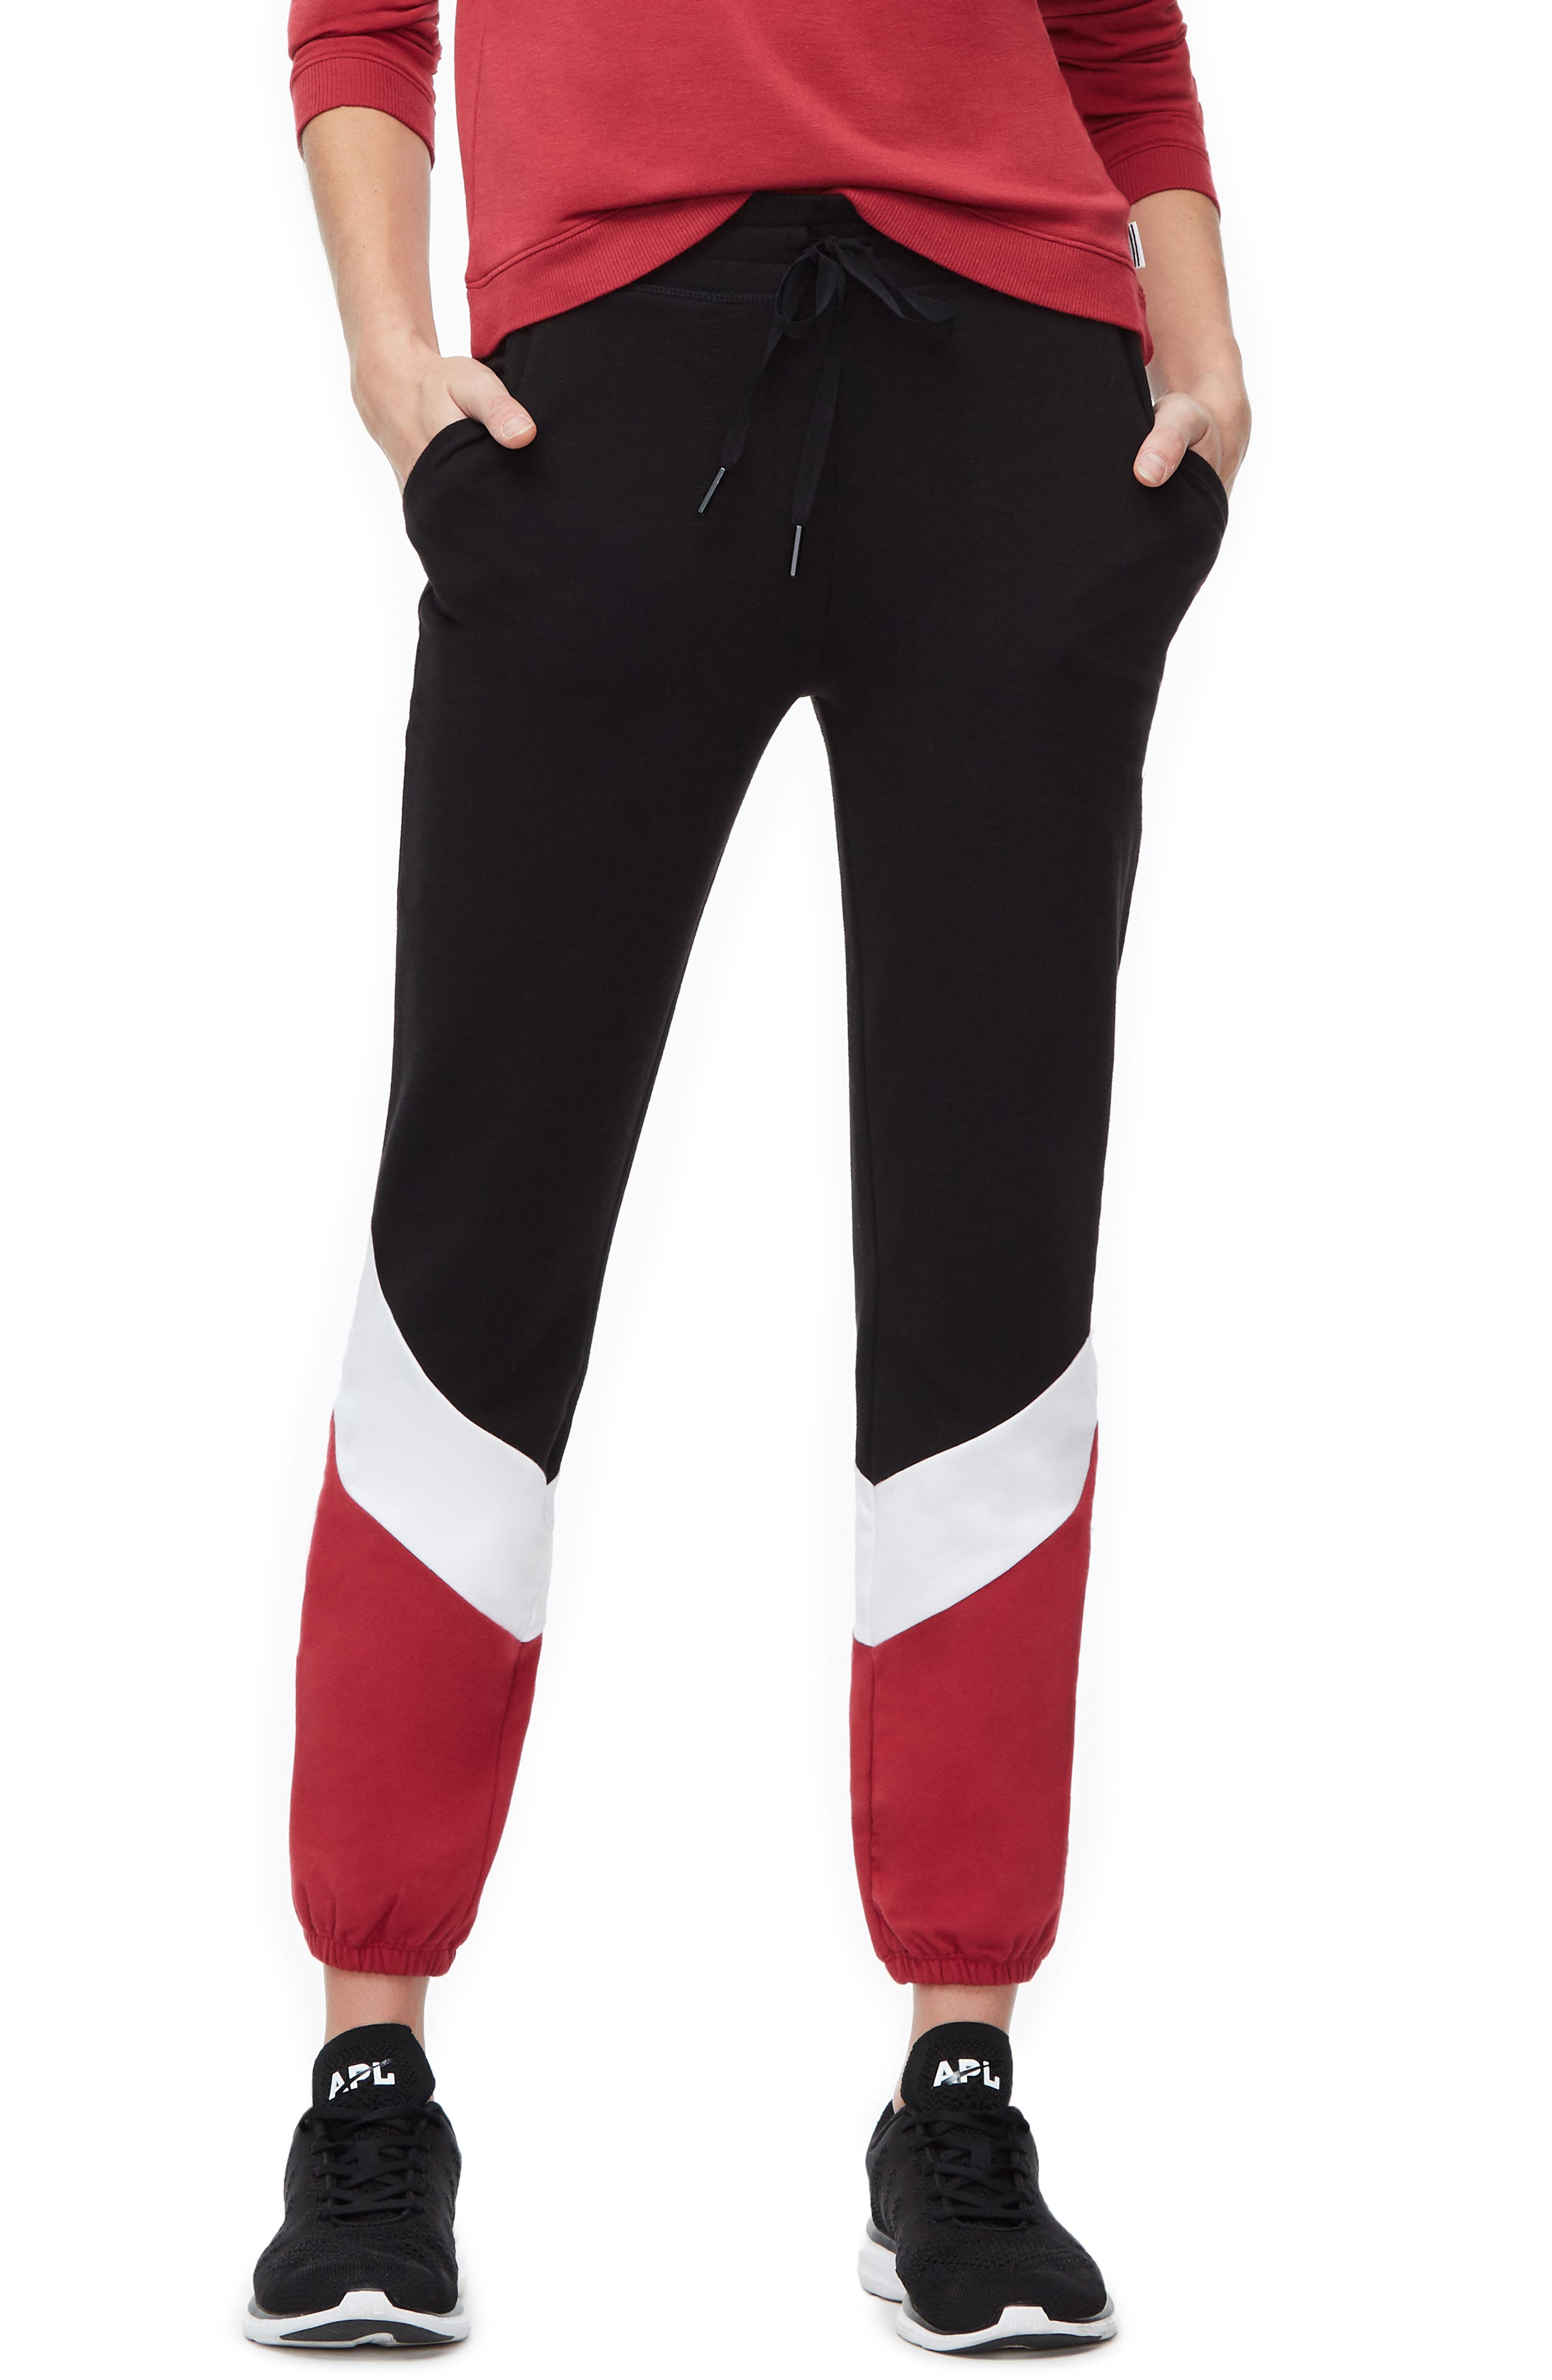 Plus Women's Good American Colorblock Sweatpants